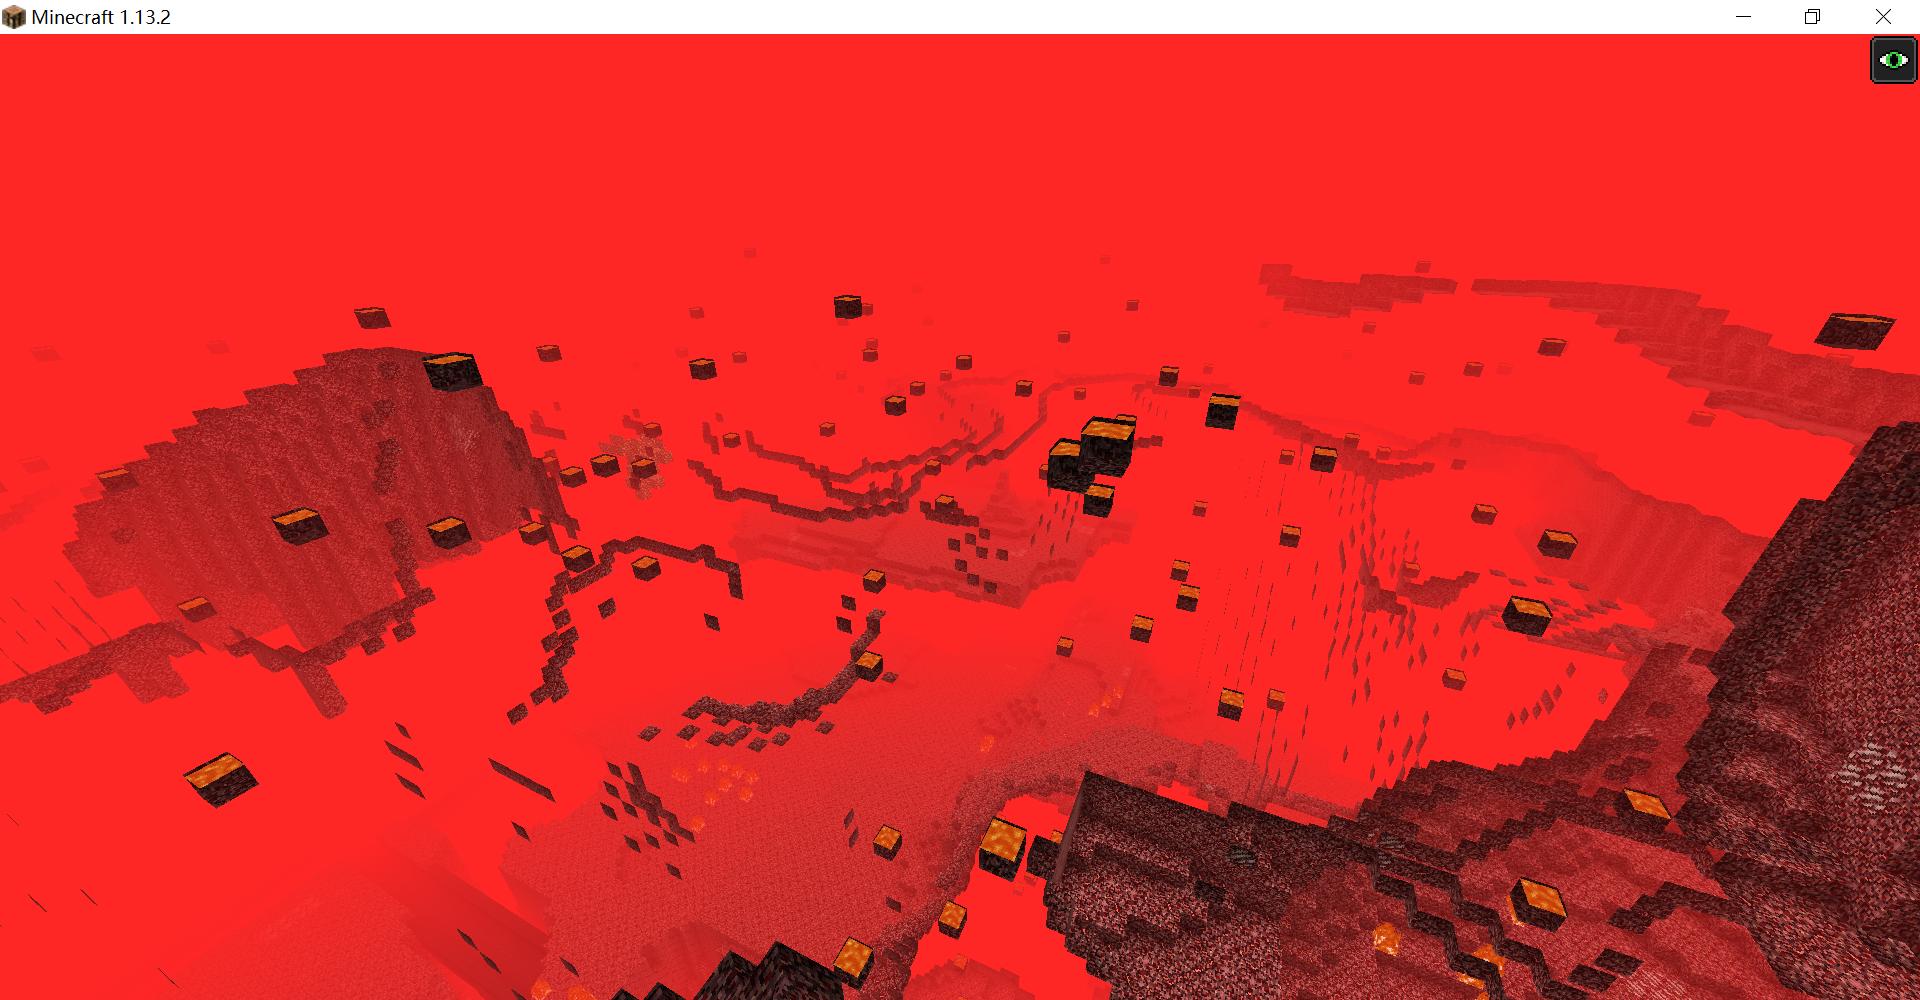 Minecraft 1.13.2 2019_11_19 21_07_45.png